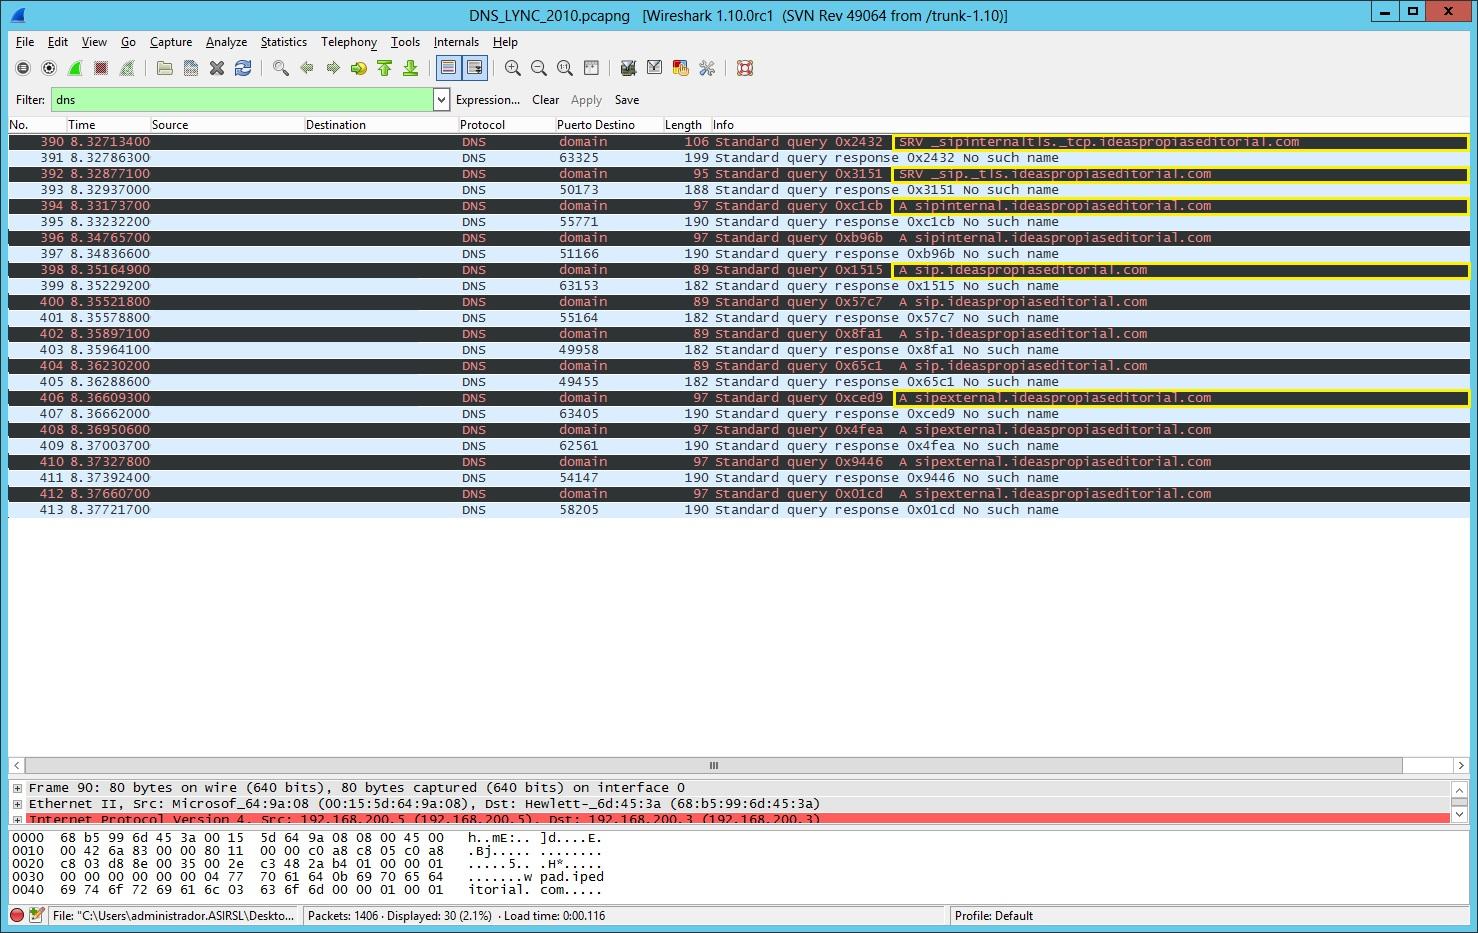 Resolucion-de-Nombres-Cliente-Lync-2010-2013_2.jpg